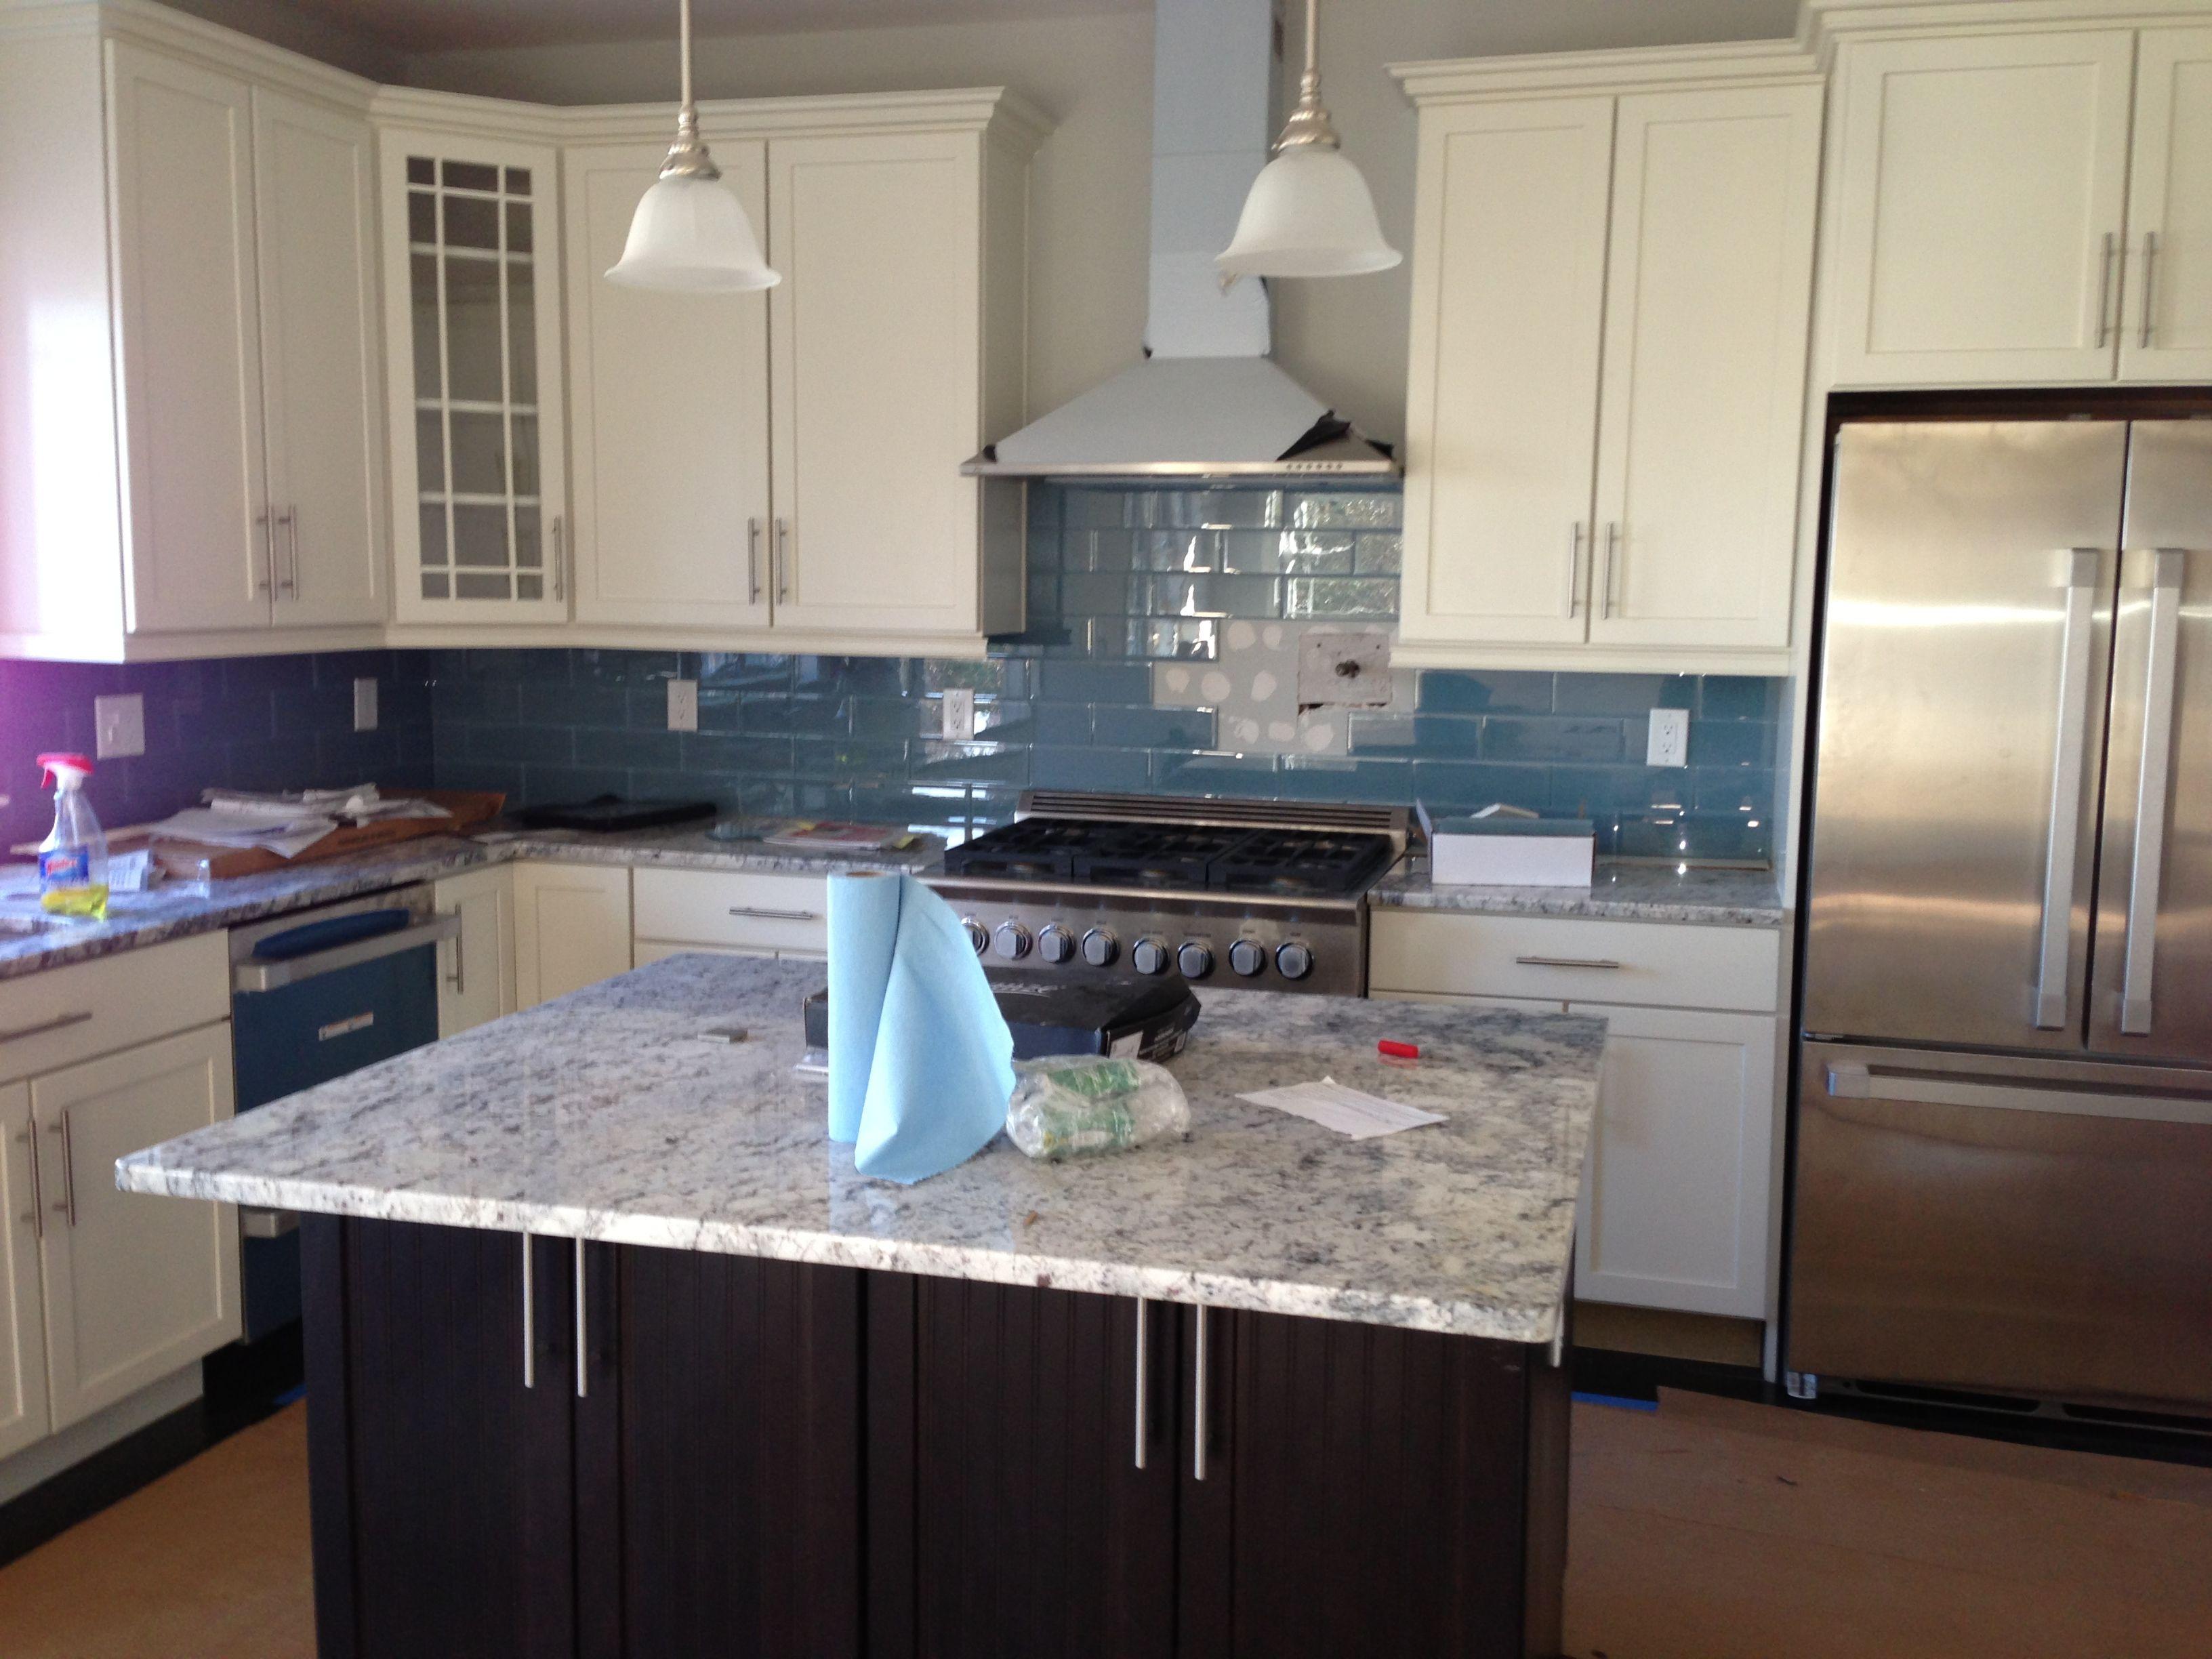 Merillat Kitchen Cabinet Doors Merillat Design Maple Wood Kona Finish Cambria Quartz